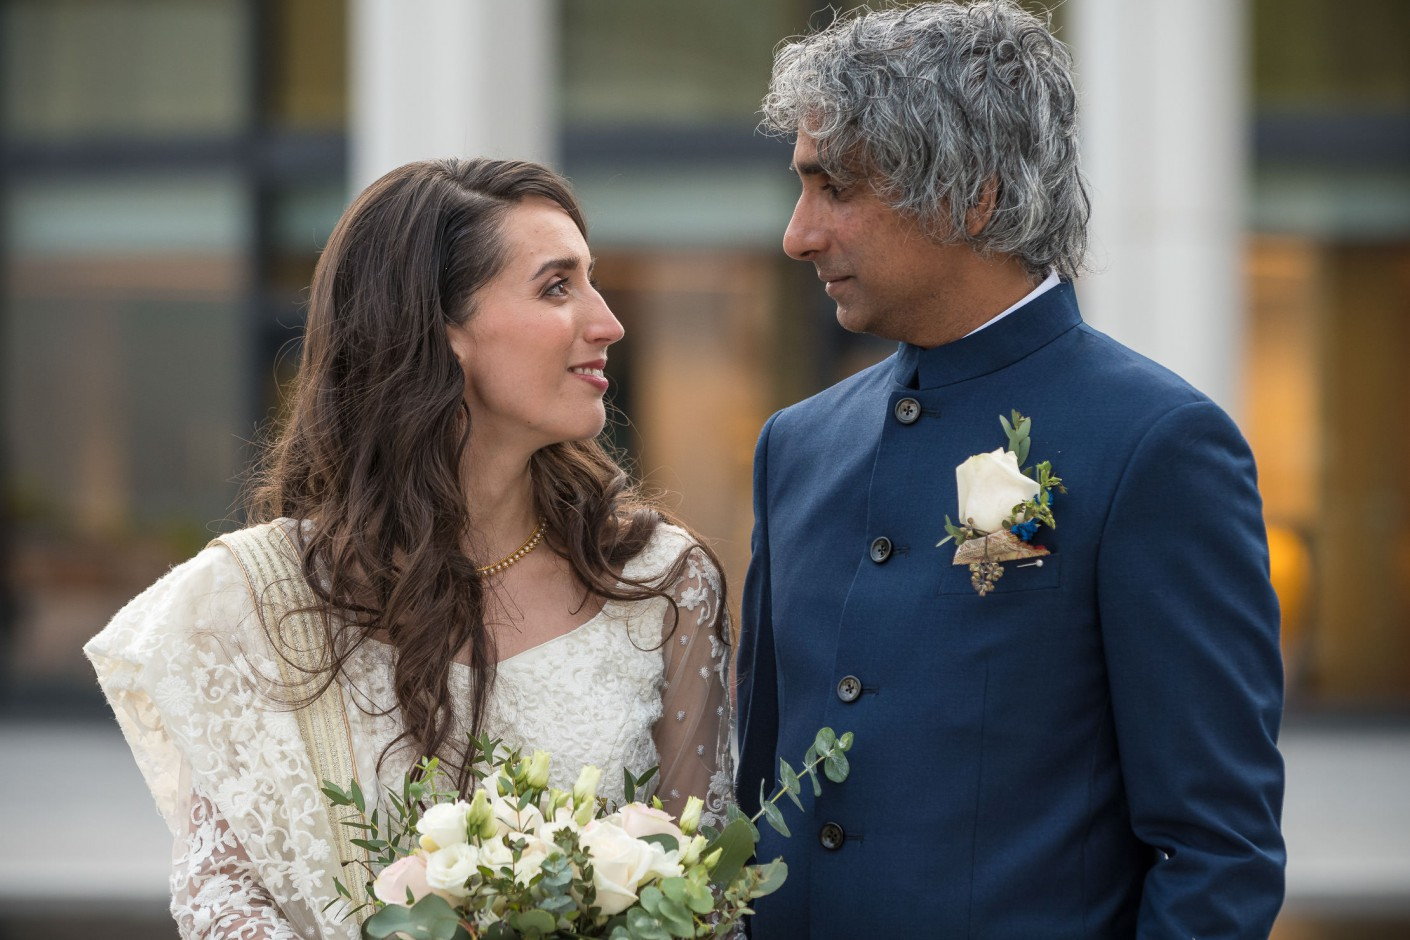 Mariage : Regards aimantés